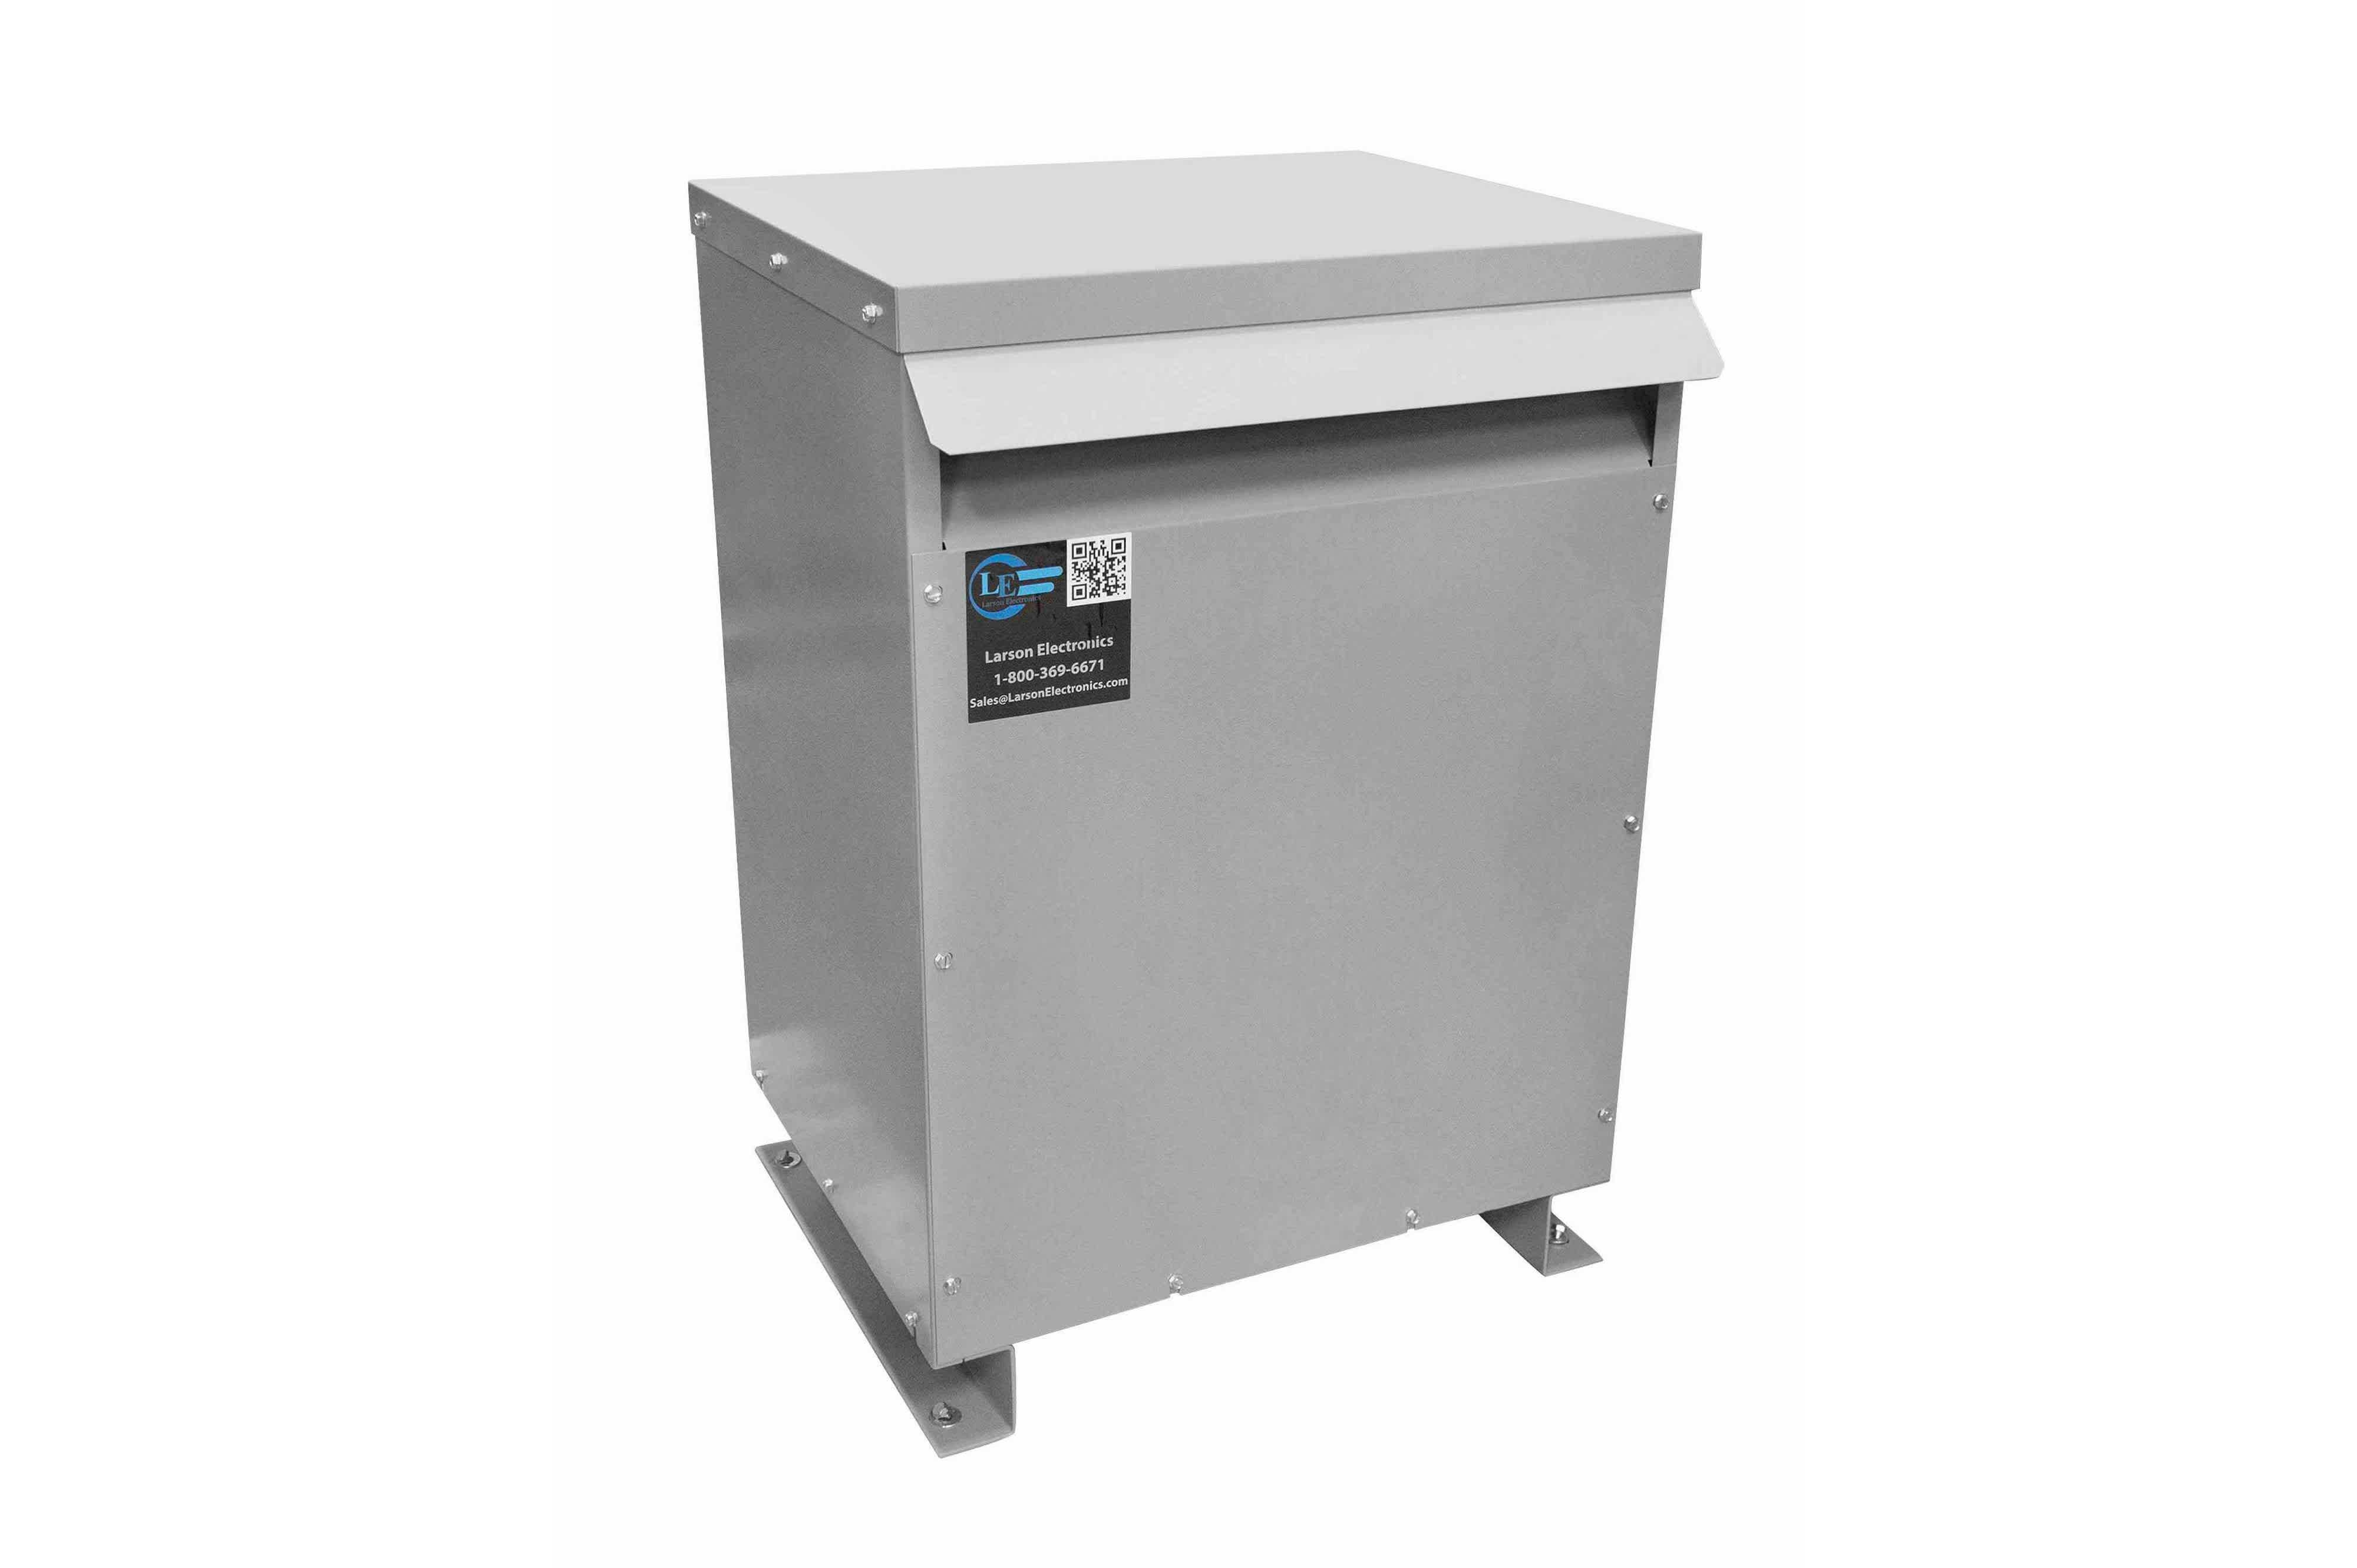 600 kVA 3PH Isolation Transformer, 240V Wye Primary, 600Y/347 Wye-N Secondary, N3R, Ventilated, 60 Hz